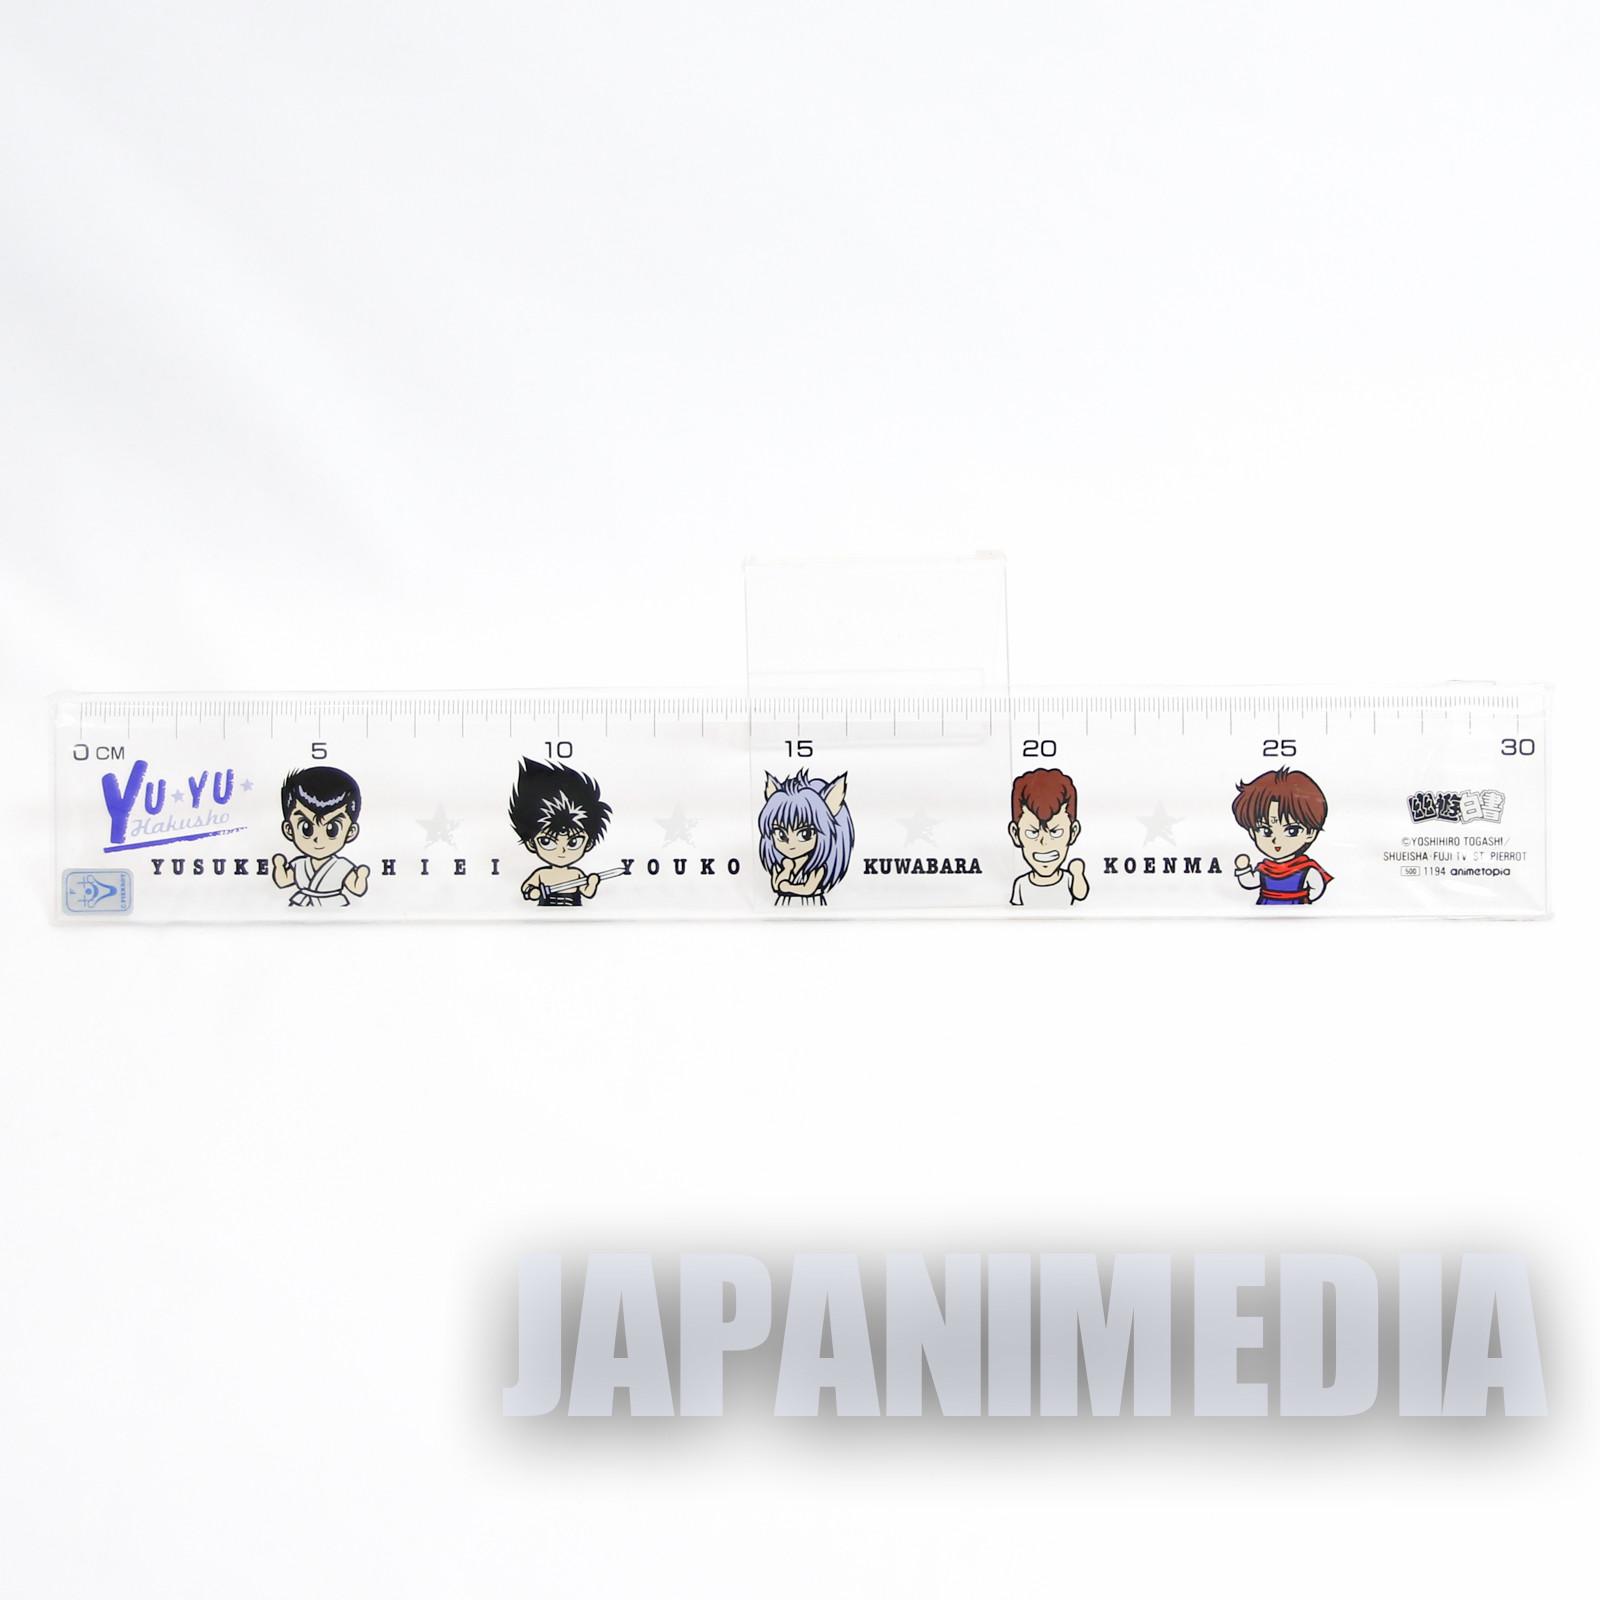 Yu Yu Hakusho Ruler 30cm Yusuke / Kuwabara / Kurama / Hiei JAPAN ANIME MANGA